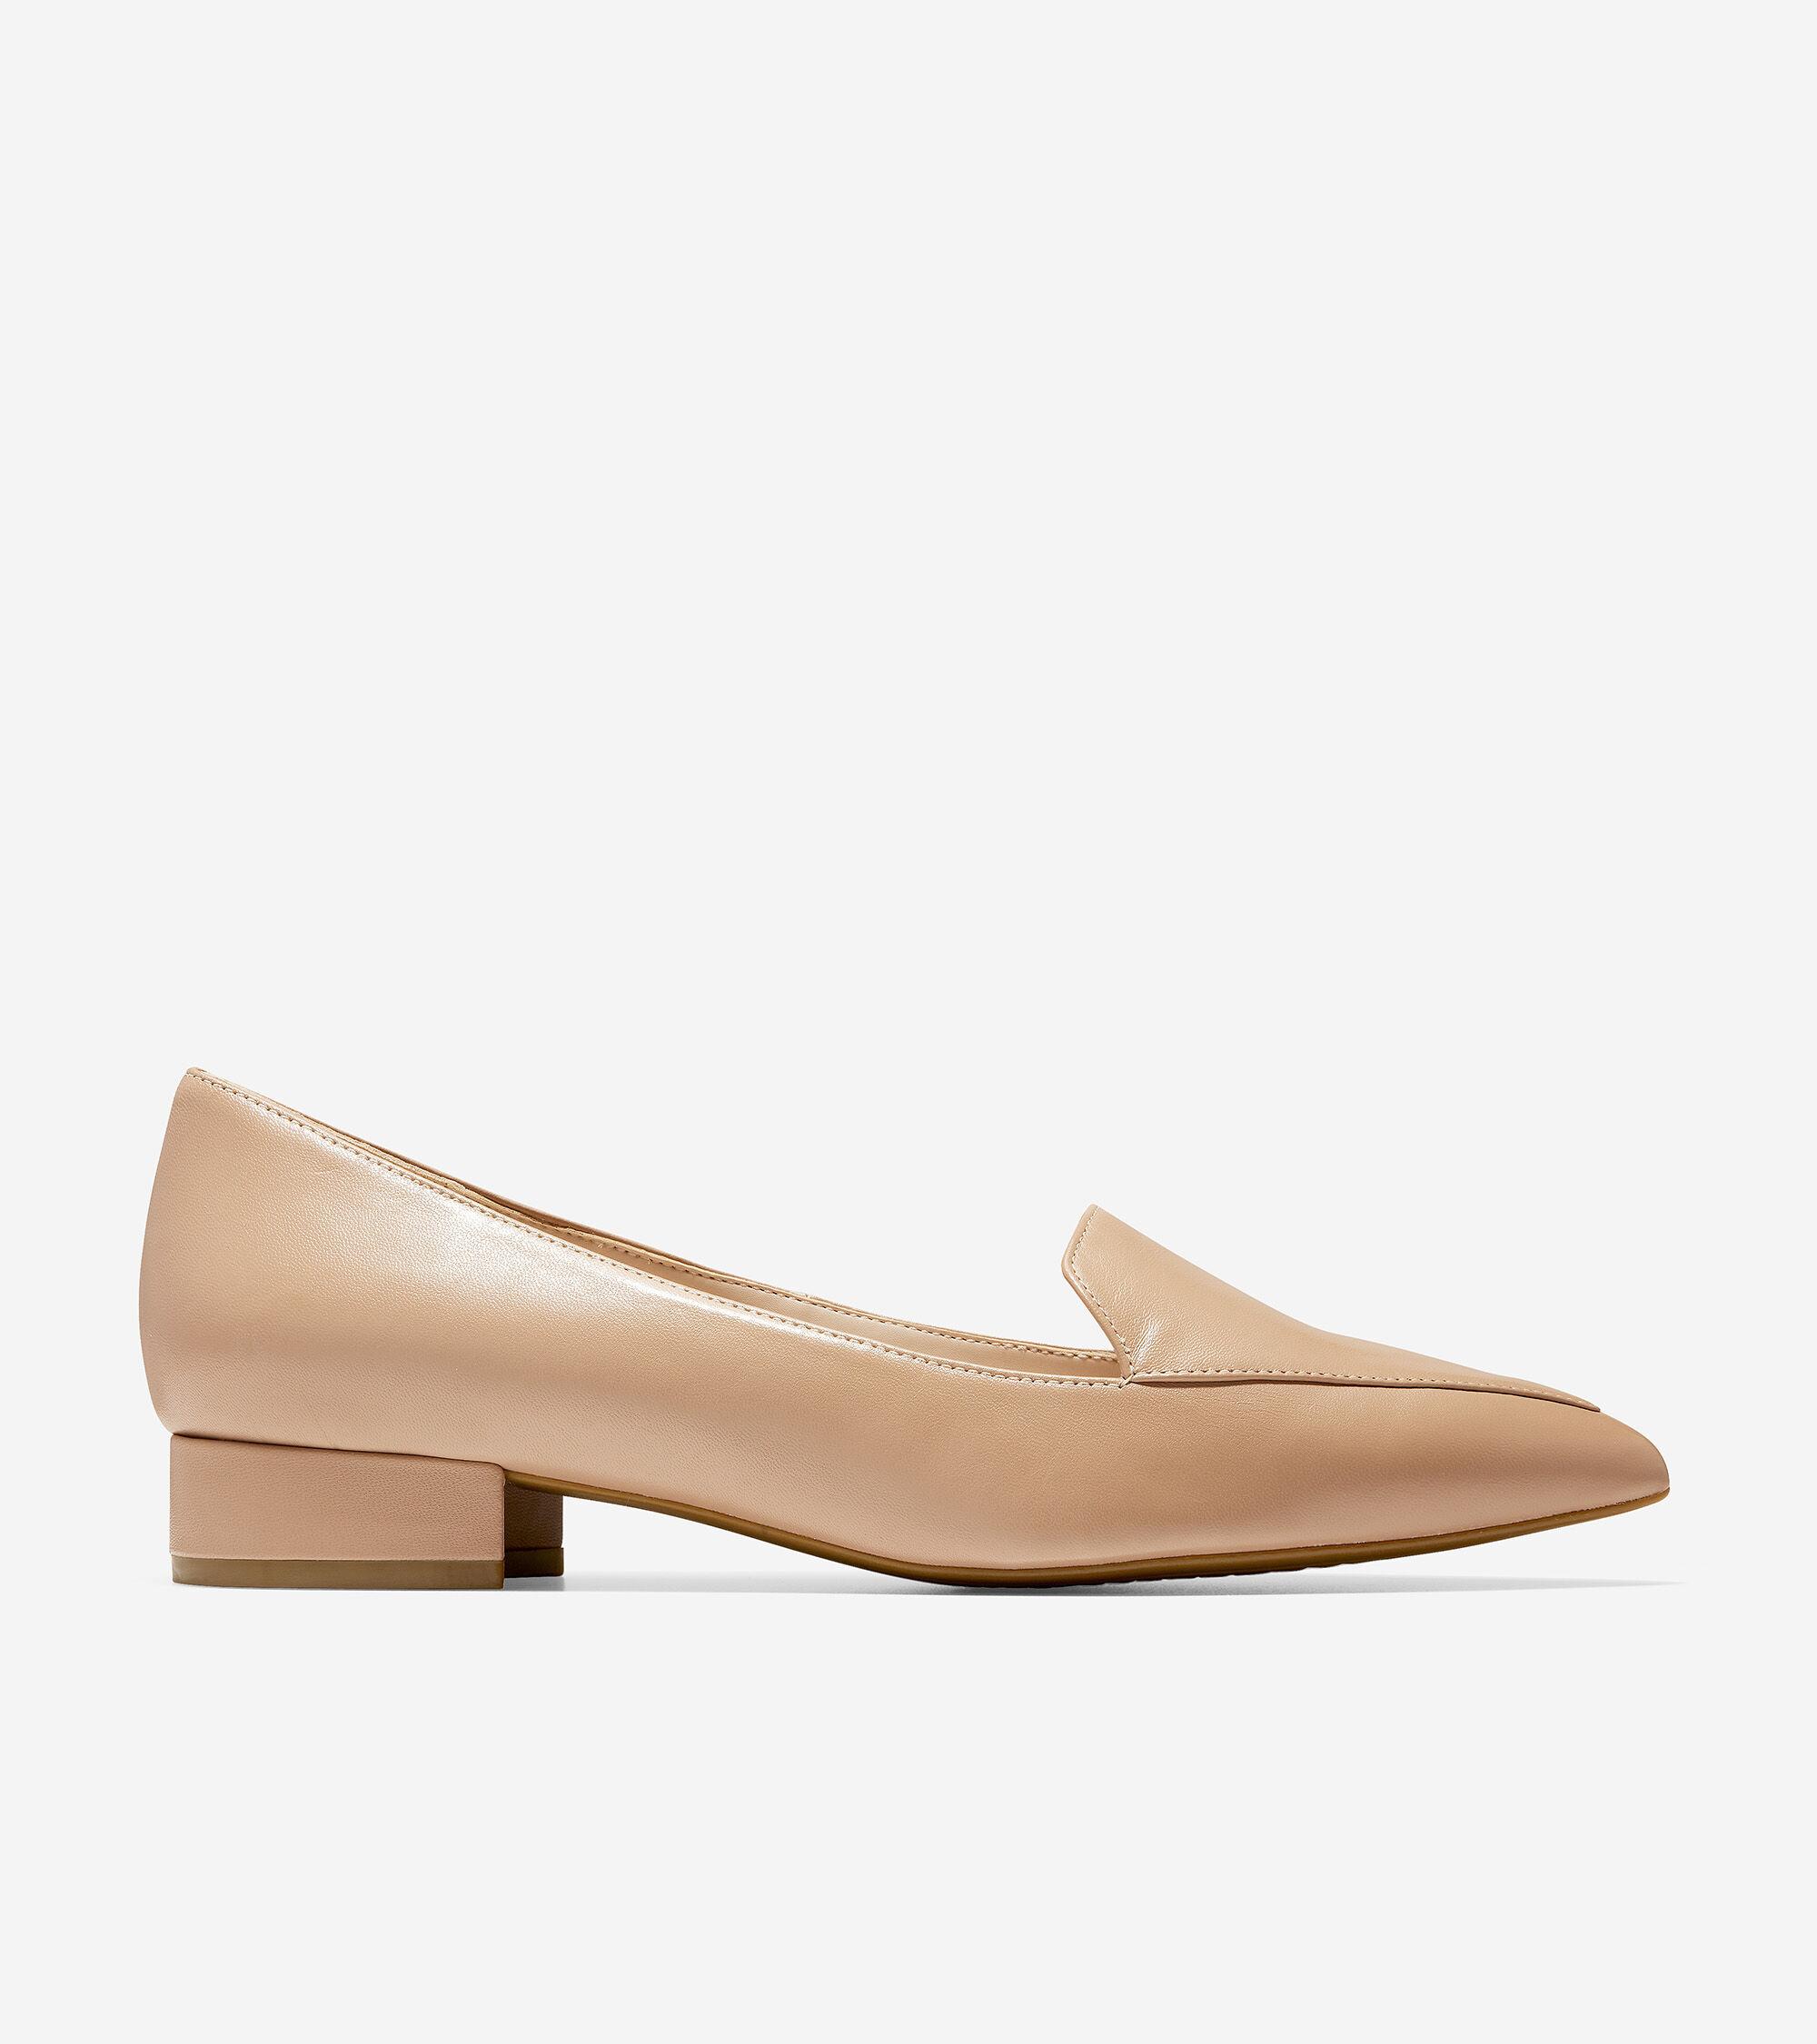 cole haan ballet flats sale